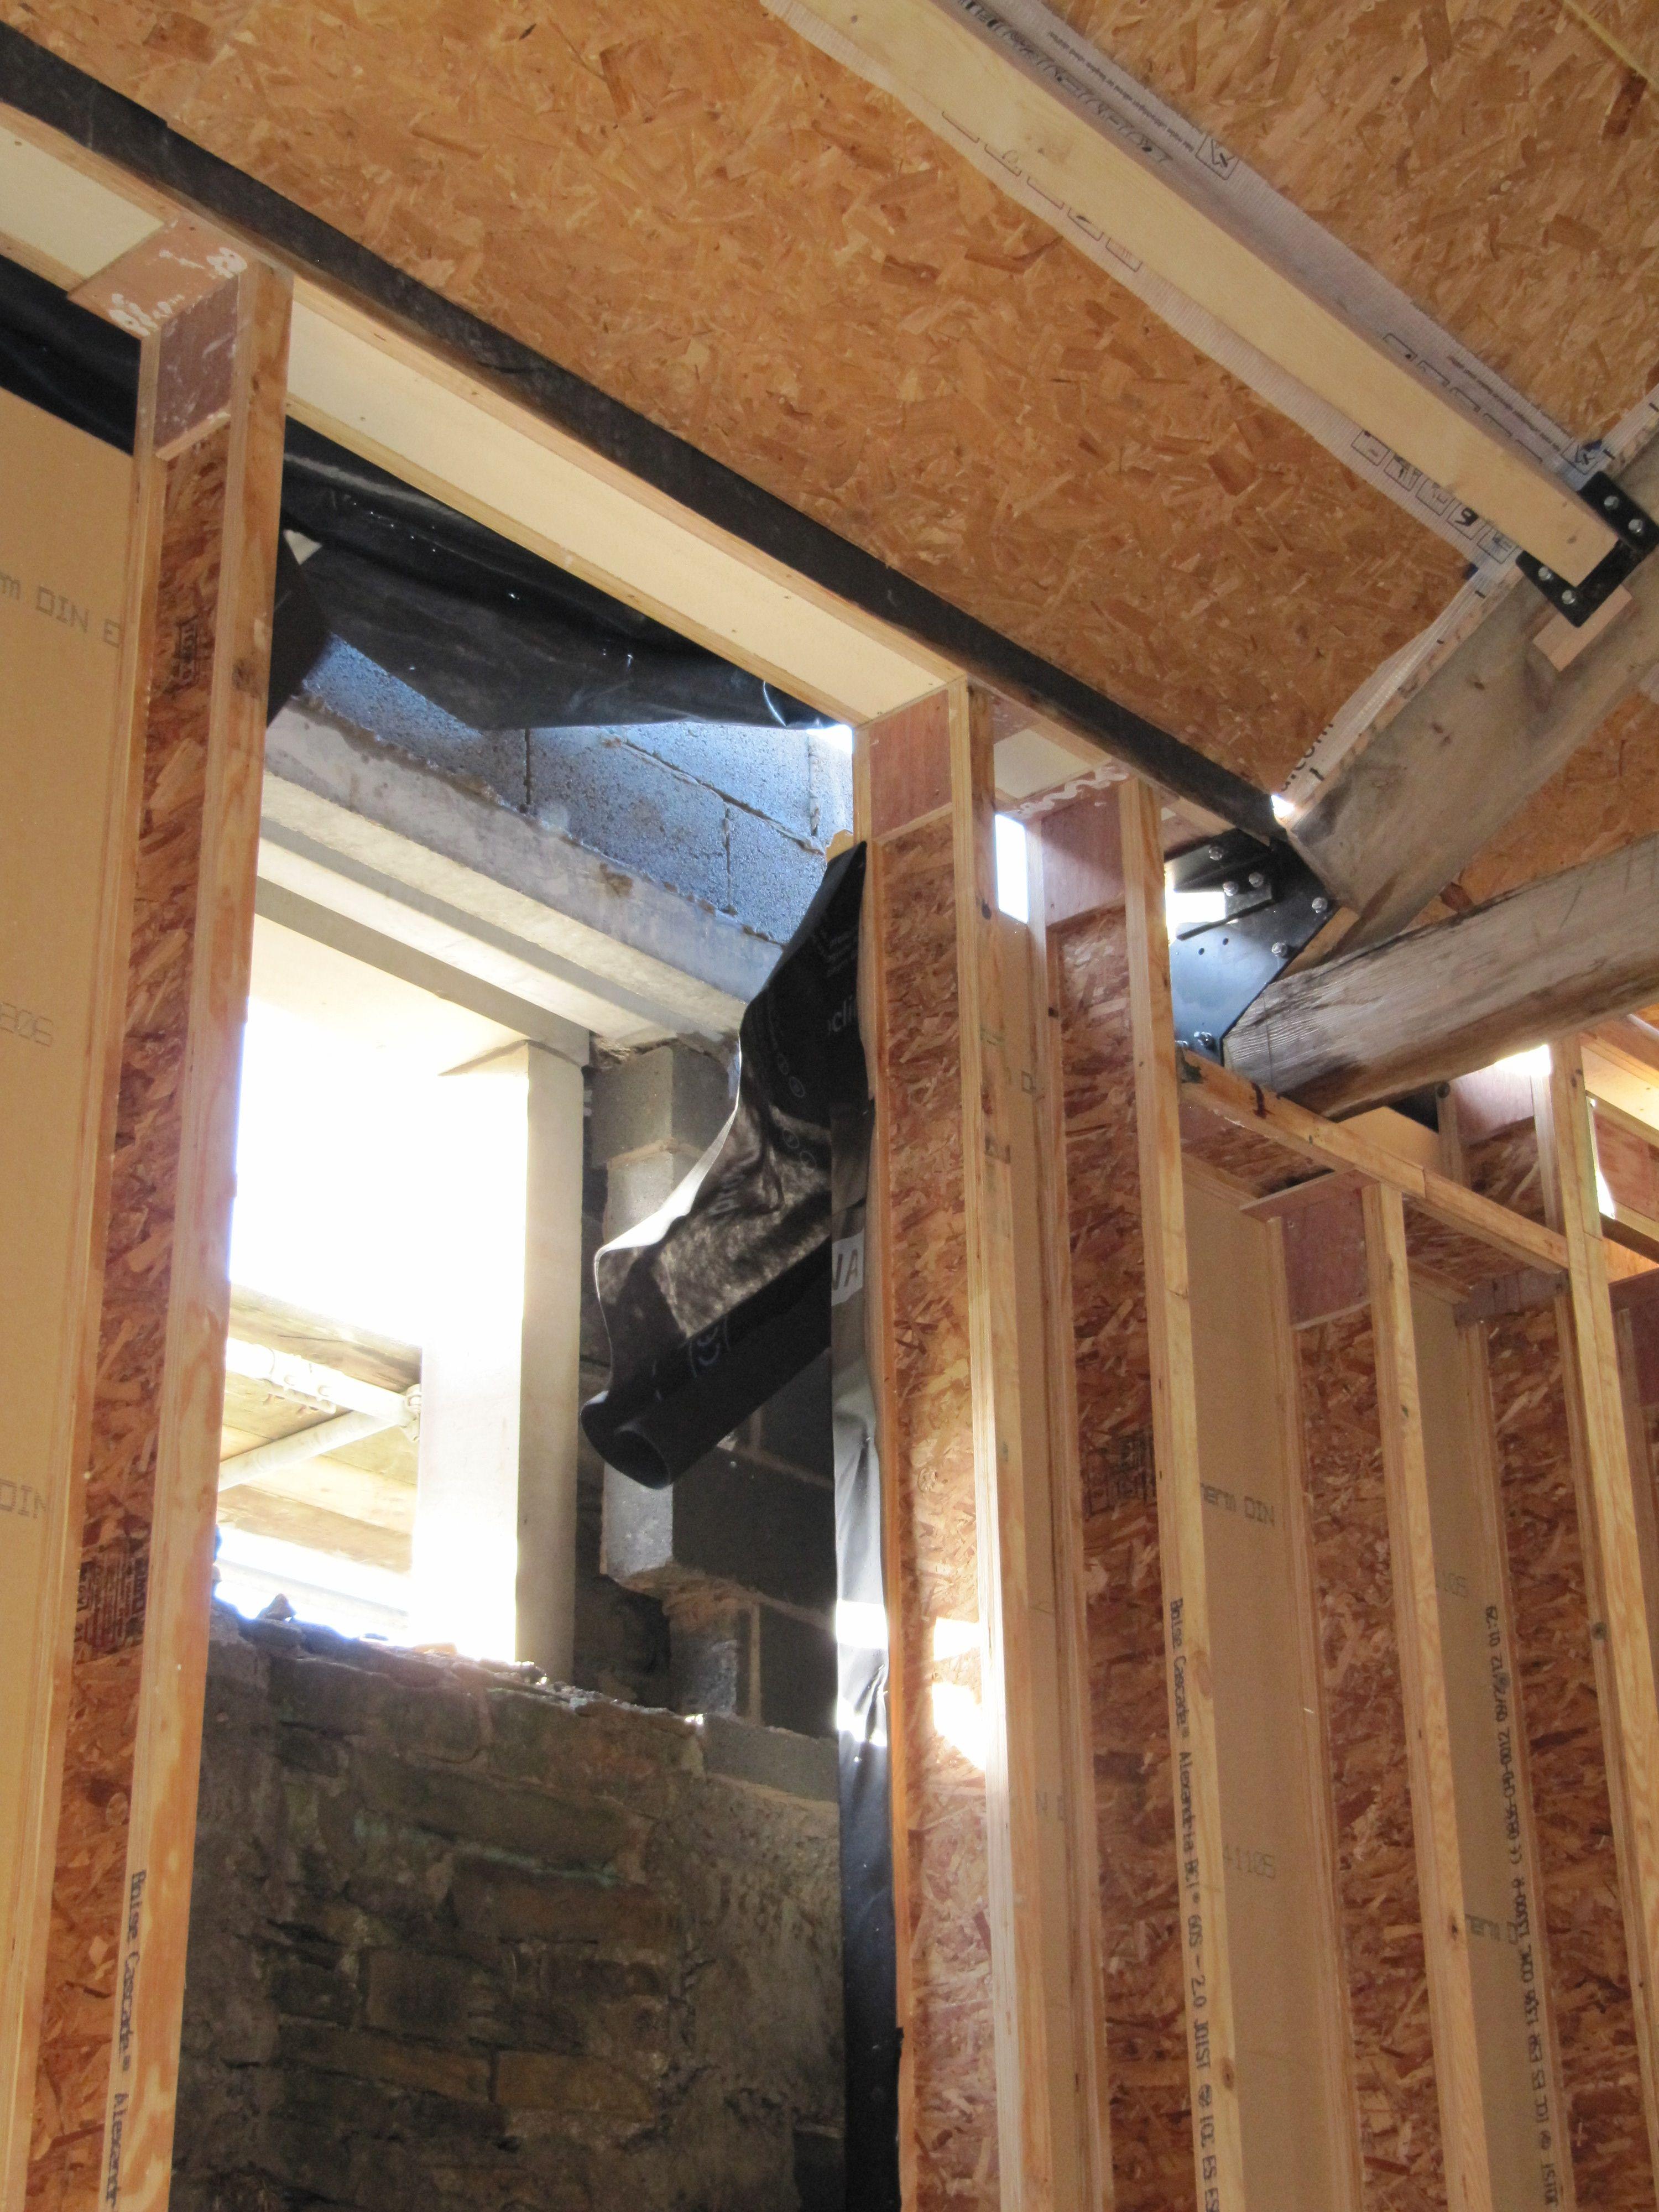 Blog outlining airtightness and insulation strategy for timber blog outlining airtightness and insulation strategy for timber frame walls at cre8 barn enerphit passivhaus retrofit solutioingenieria Gallery